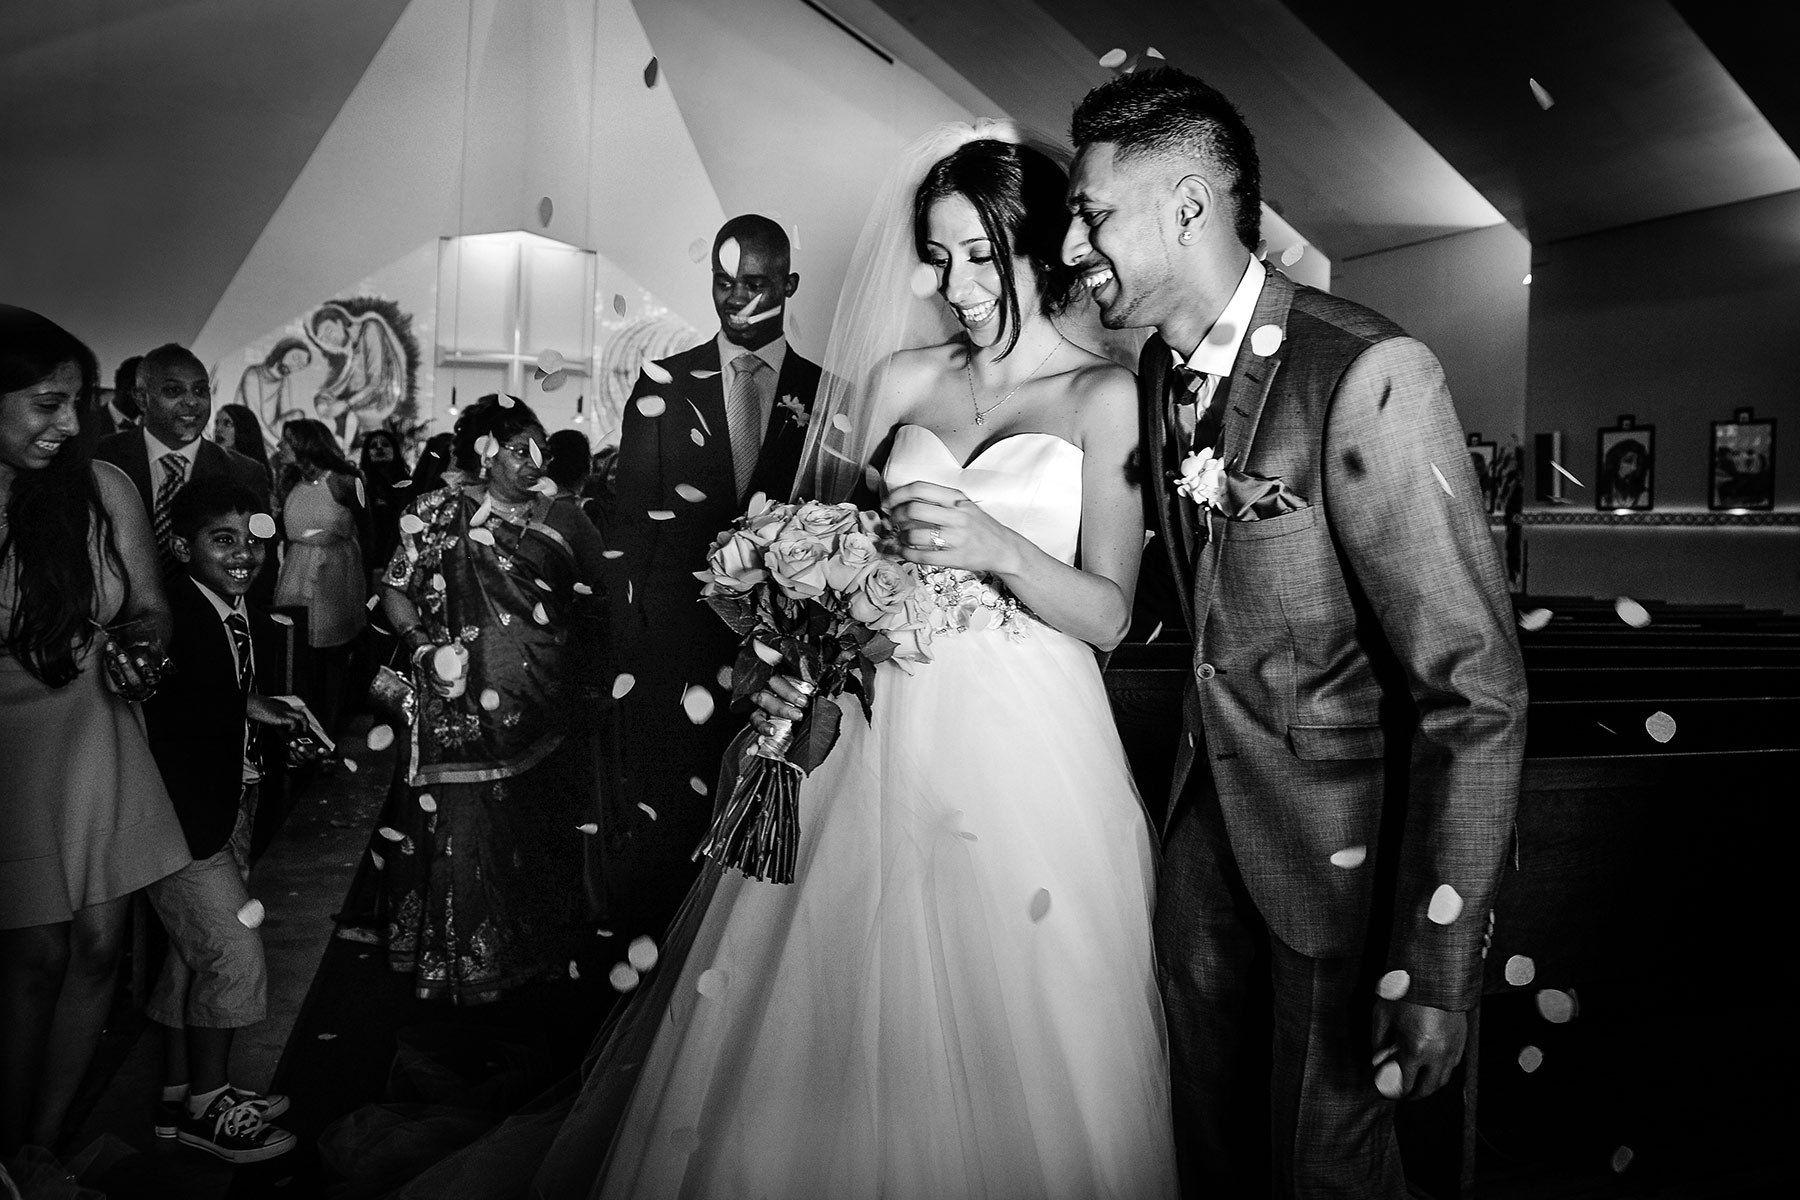 Montreal wedding ceremony, happy bride and groom